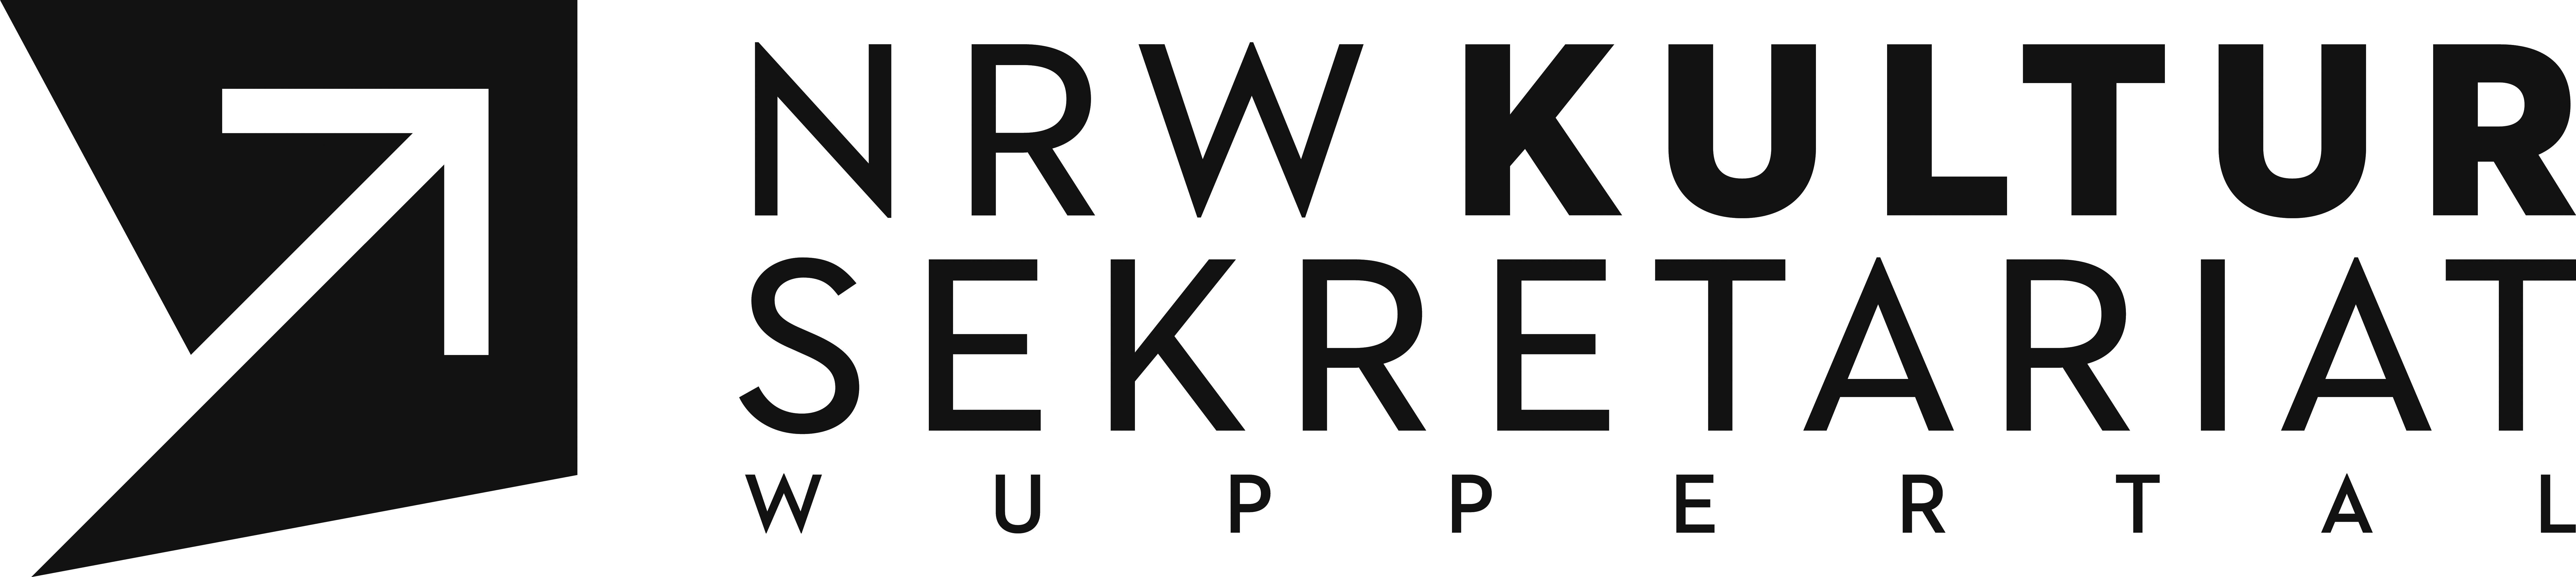 NRWKS_s